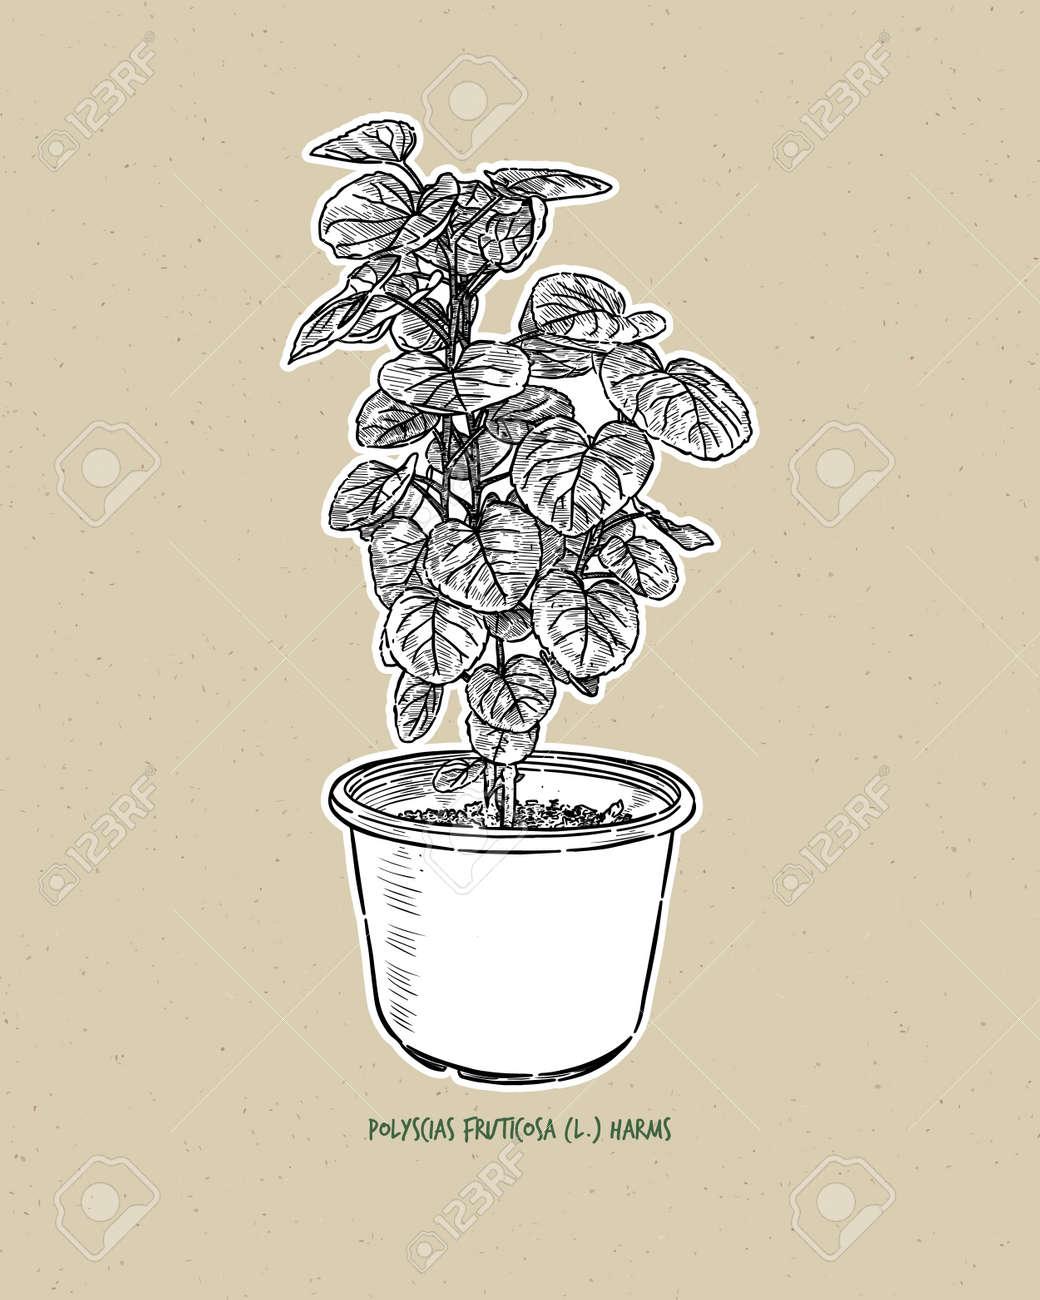 Polyscias fruticosa (L.) Harms. Polyscias fruticosa, or Ming Aralia, hand draw sketch vector. - 165340365